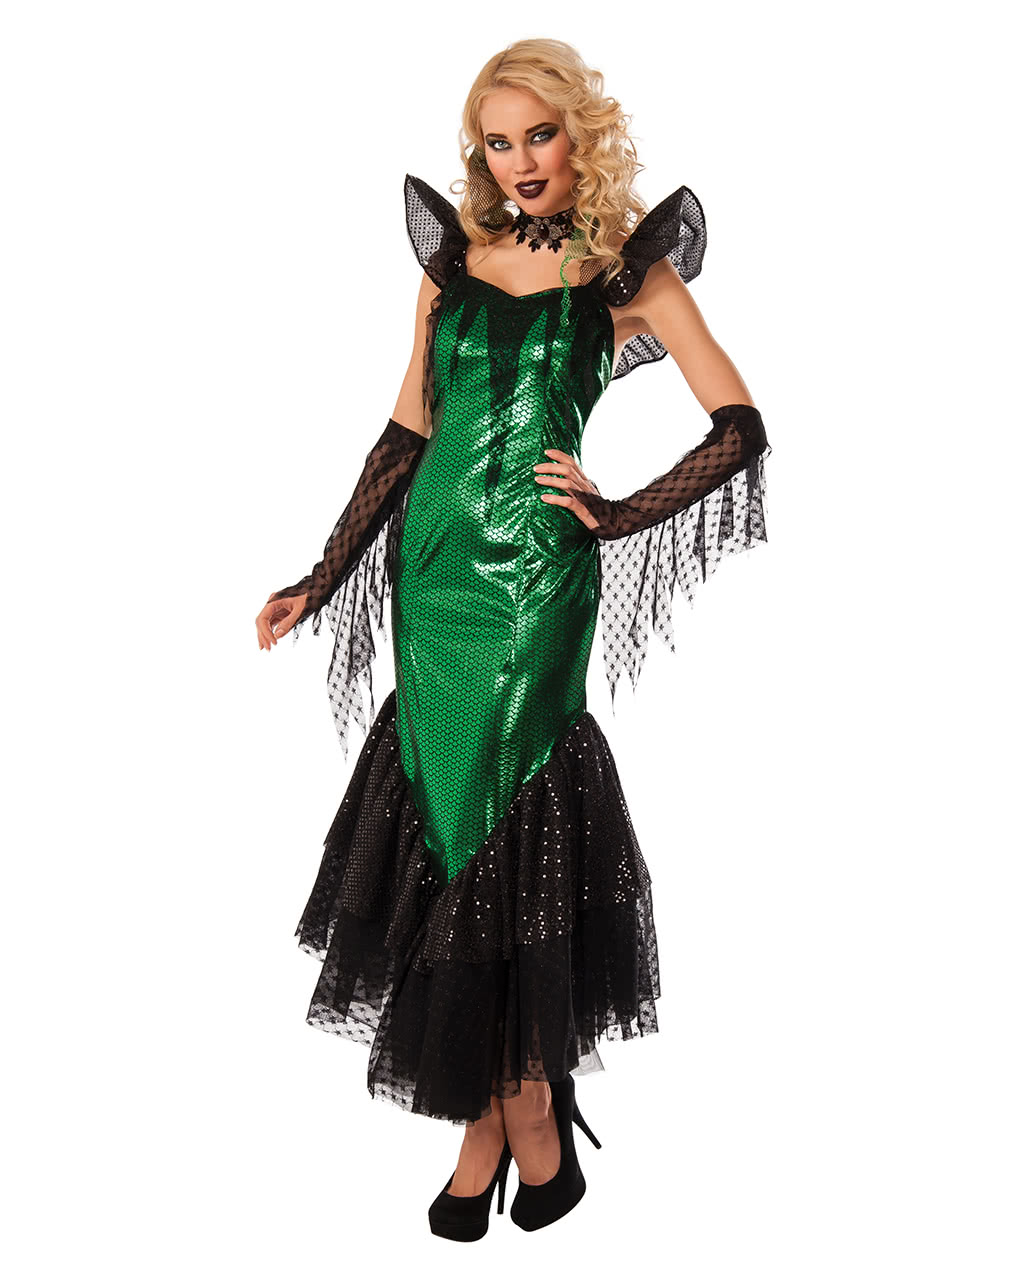 gothic mermaid costume for halloween horror. Black Bedroom Furniture Sets. Home Design Ideas